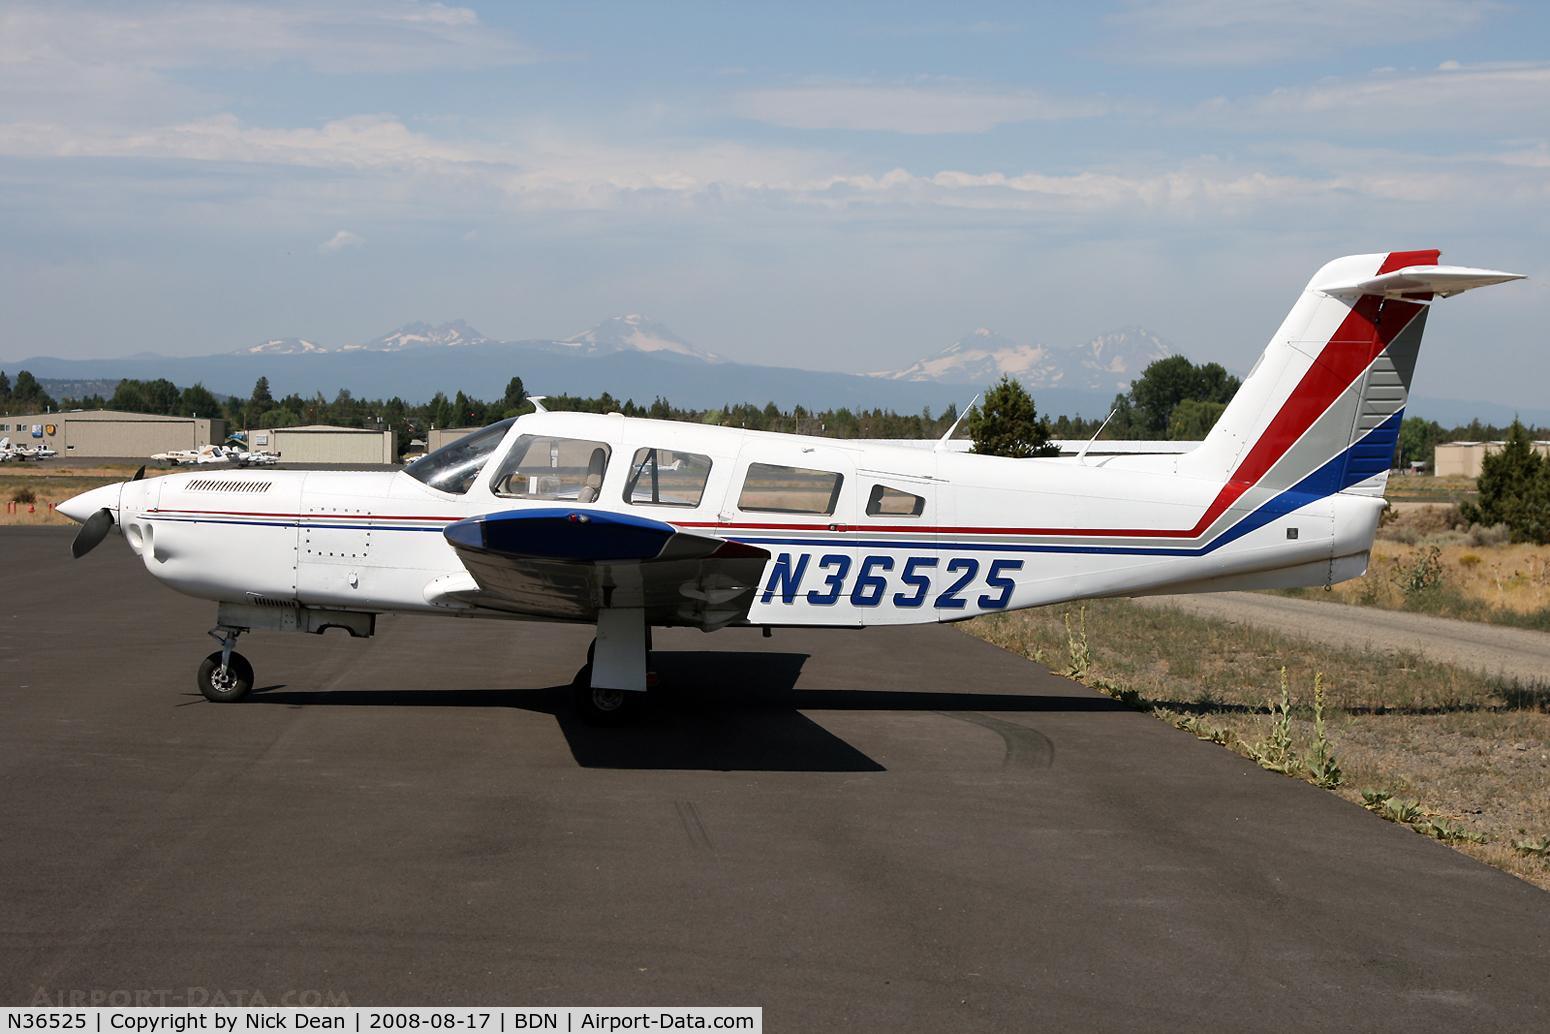 N36525, 1978 Piper PA-32RT-300T Turbo Lance II C/N 32R-7887050, /